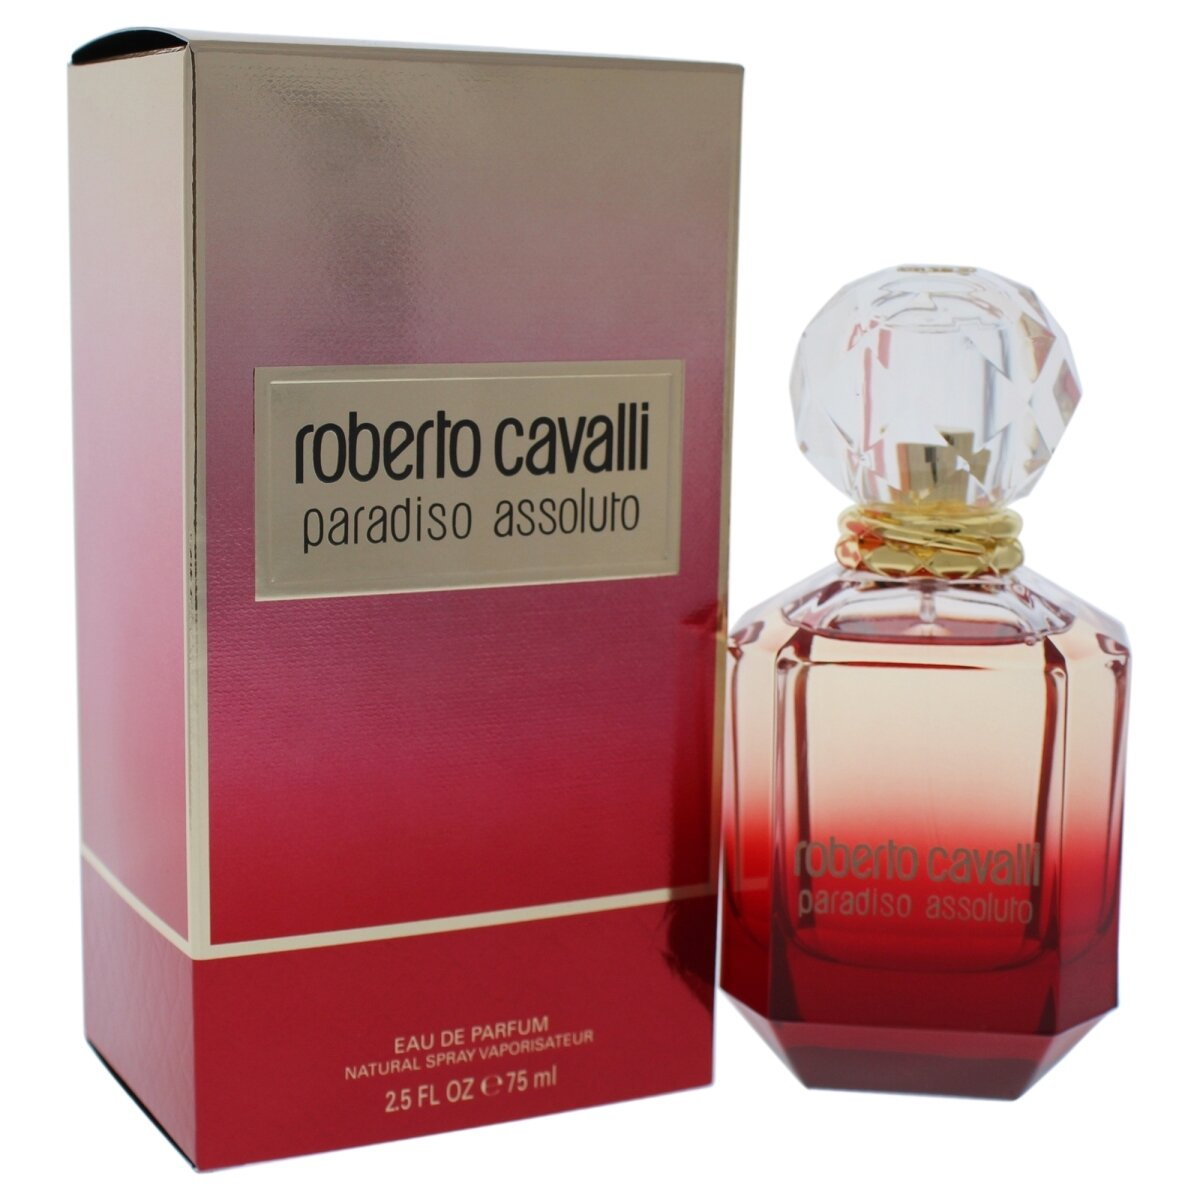 ROBERTO CAVALLI PARADISO ASSOULTO FOR WOMEN EDP 75 ML